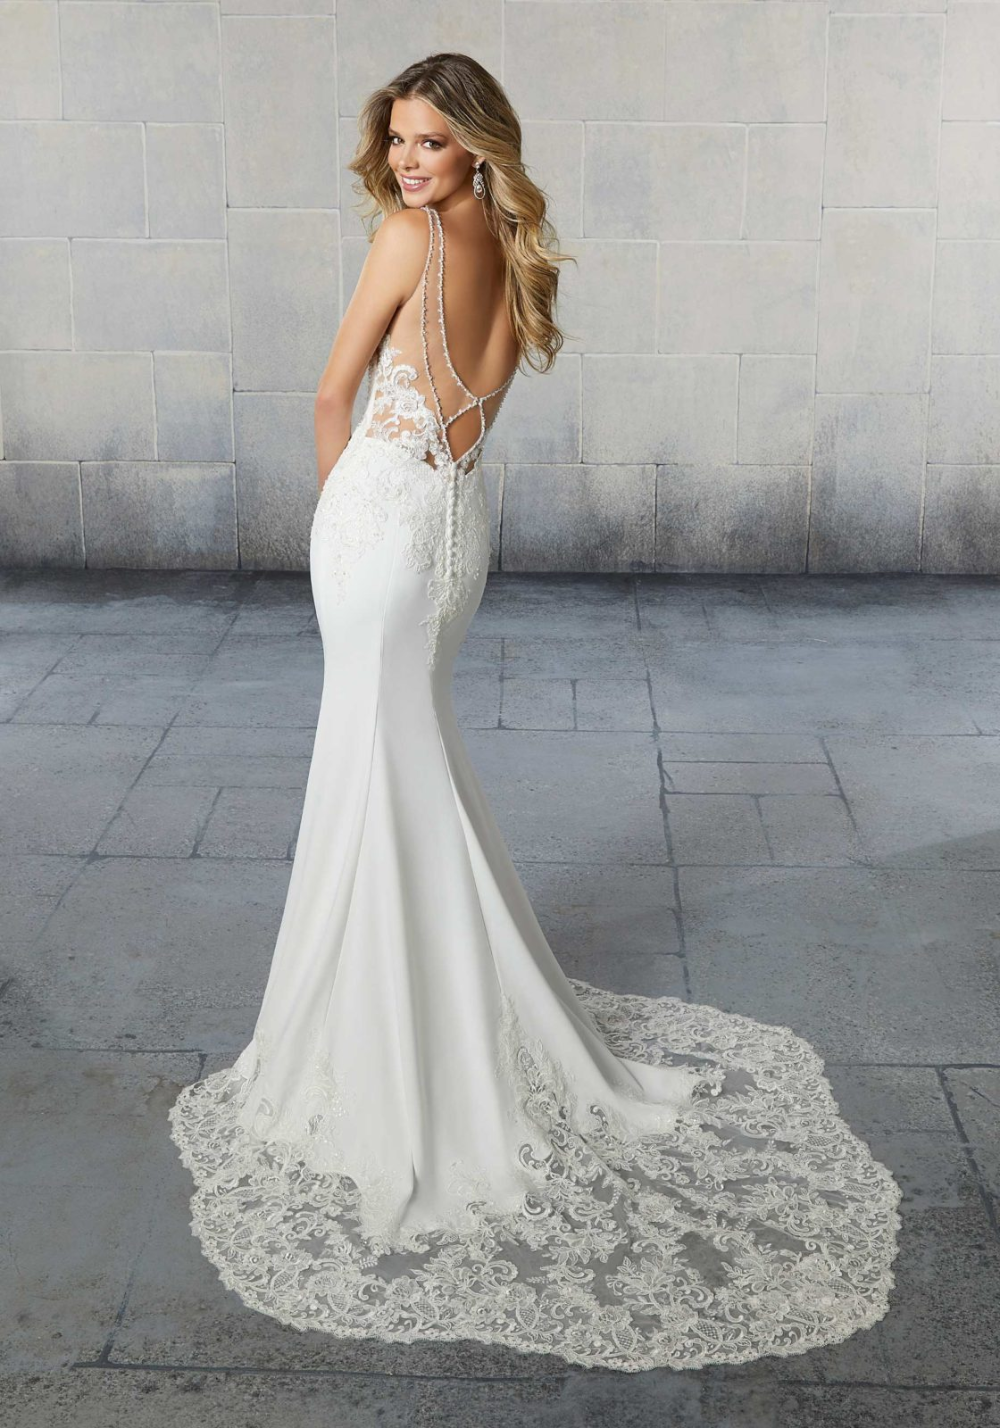 Shea Wedding Dress Morilee In 2020 Crepe Wedding Dress